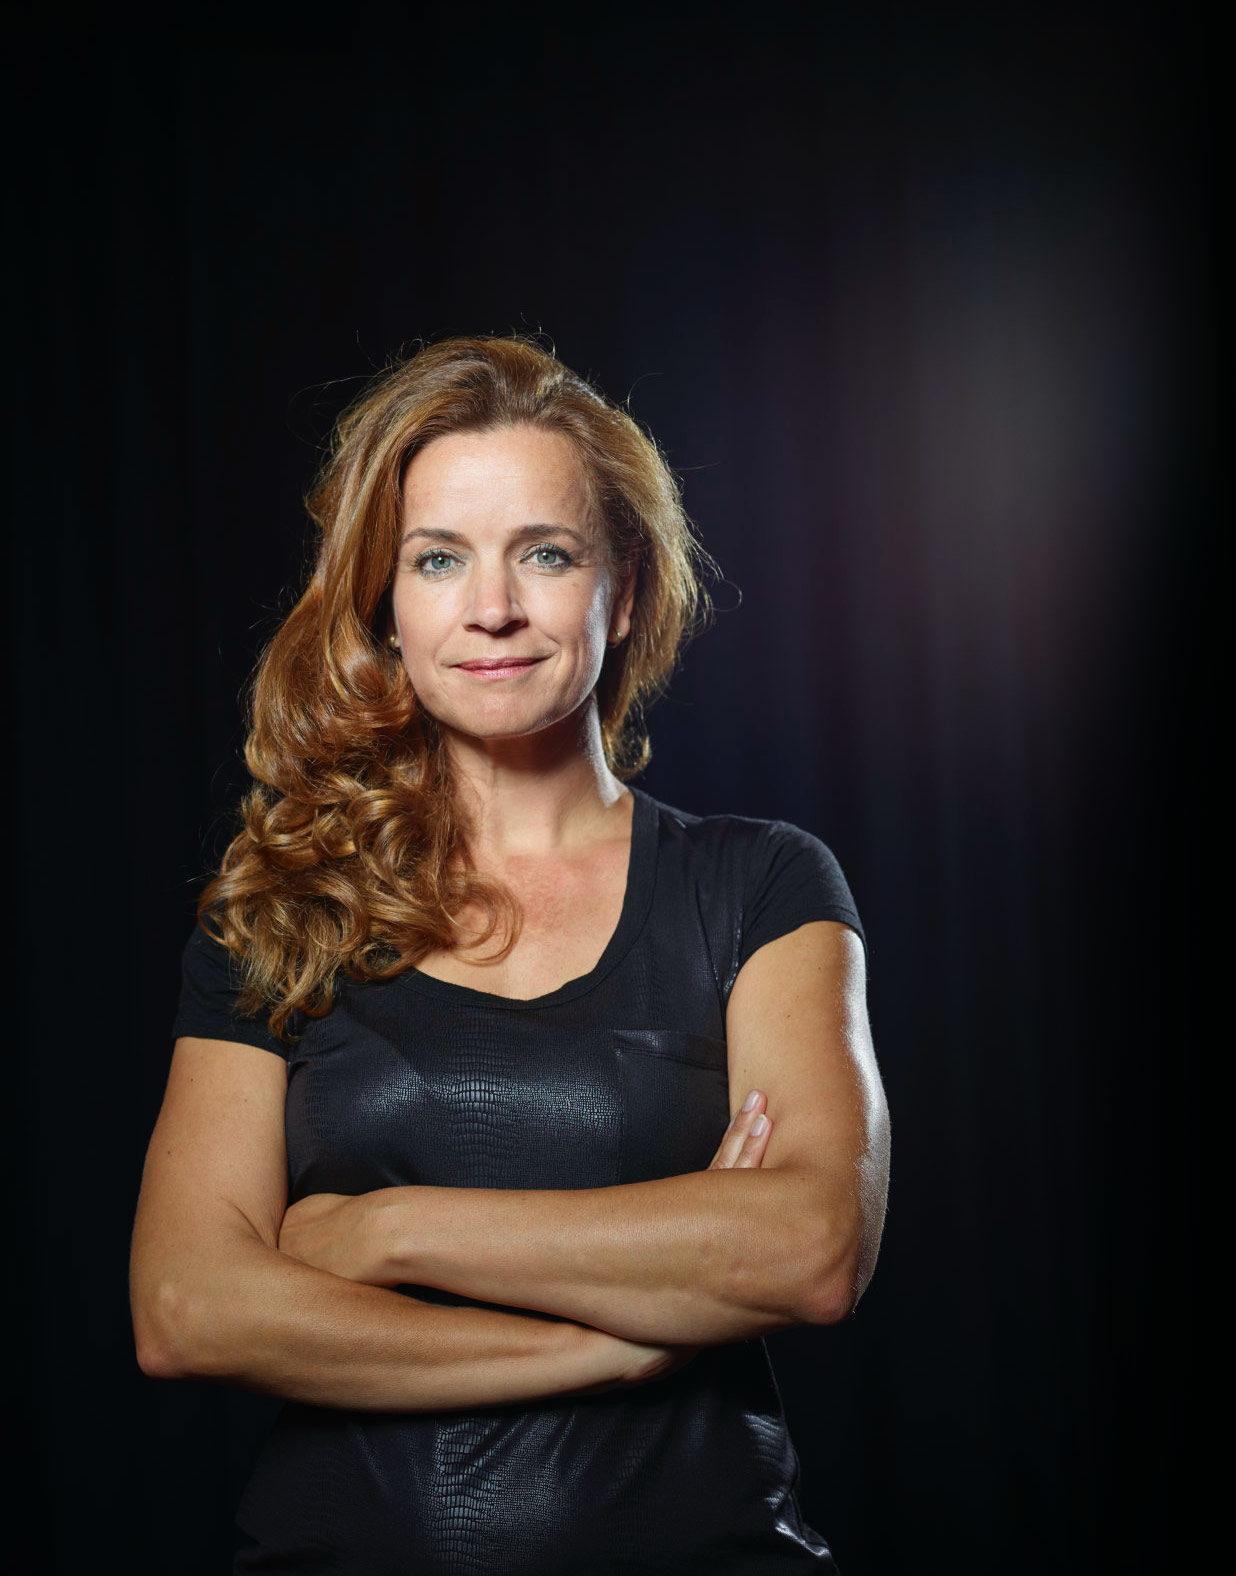 Anouschka Portret